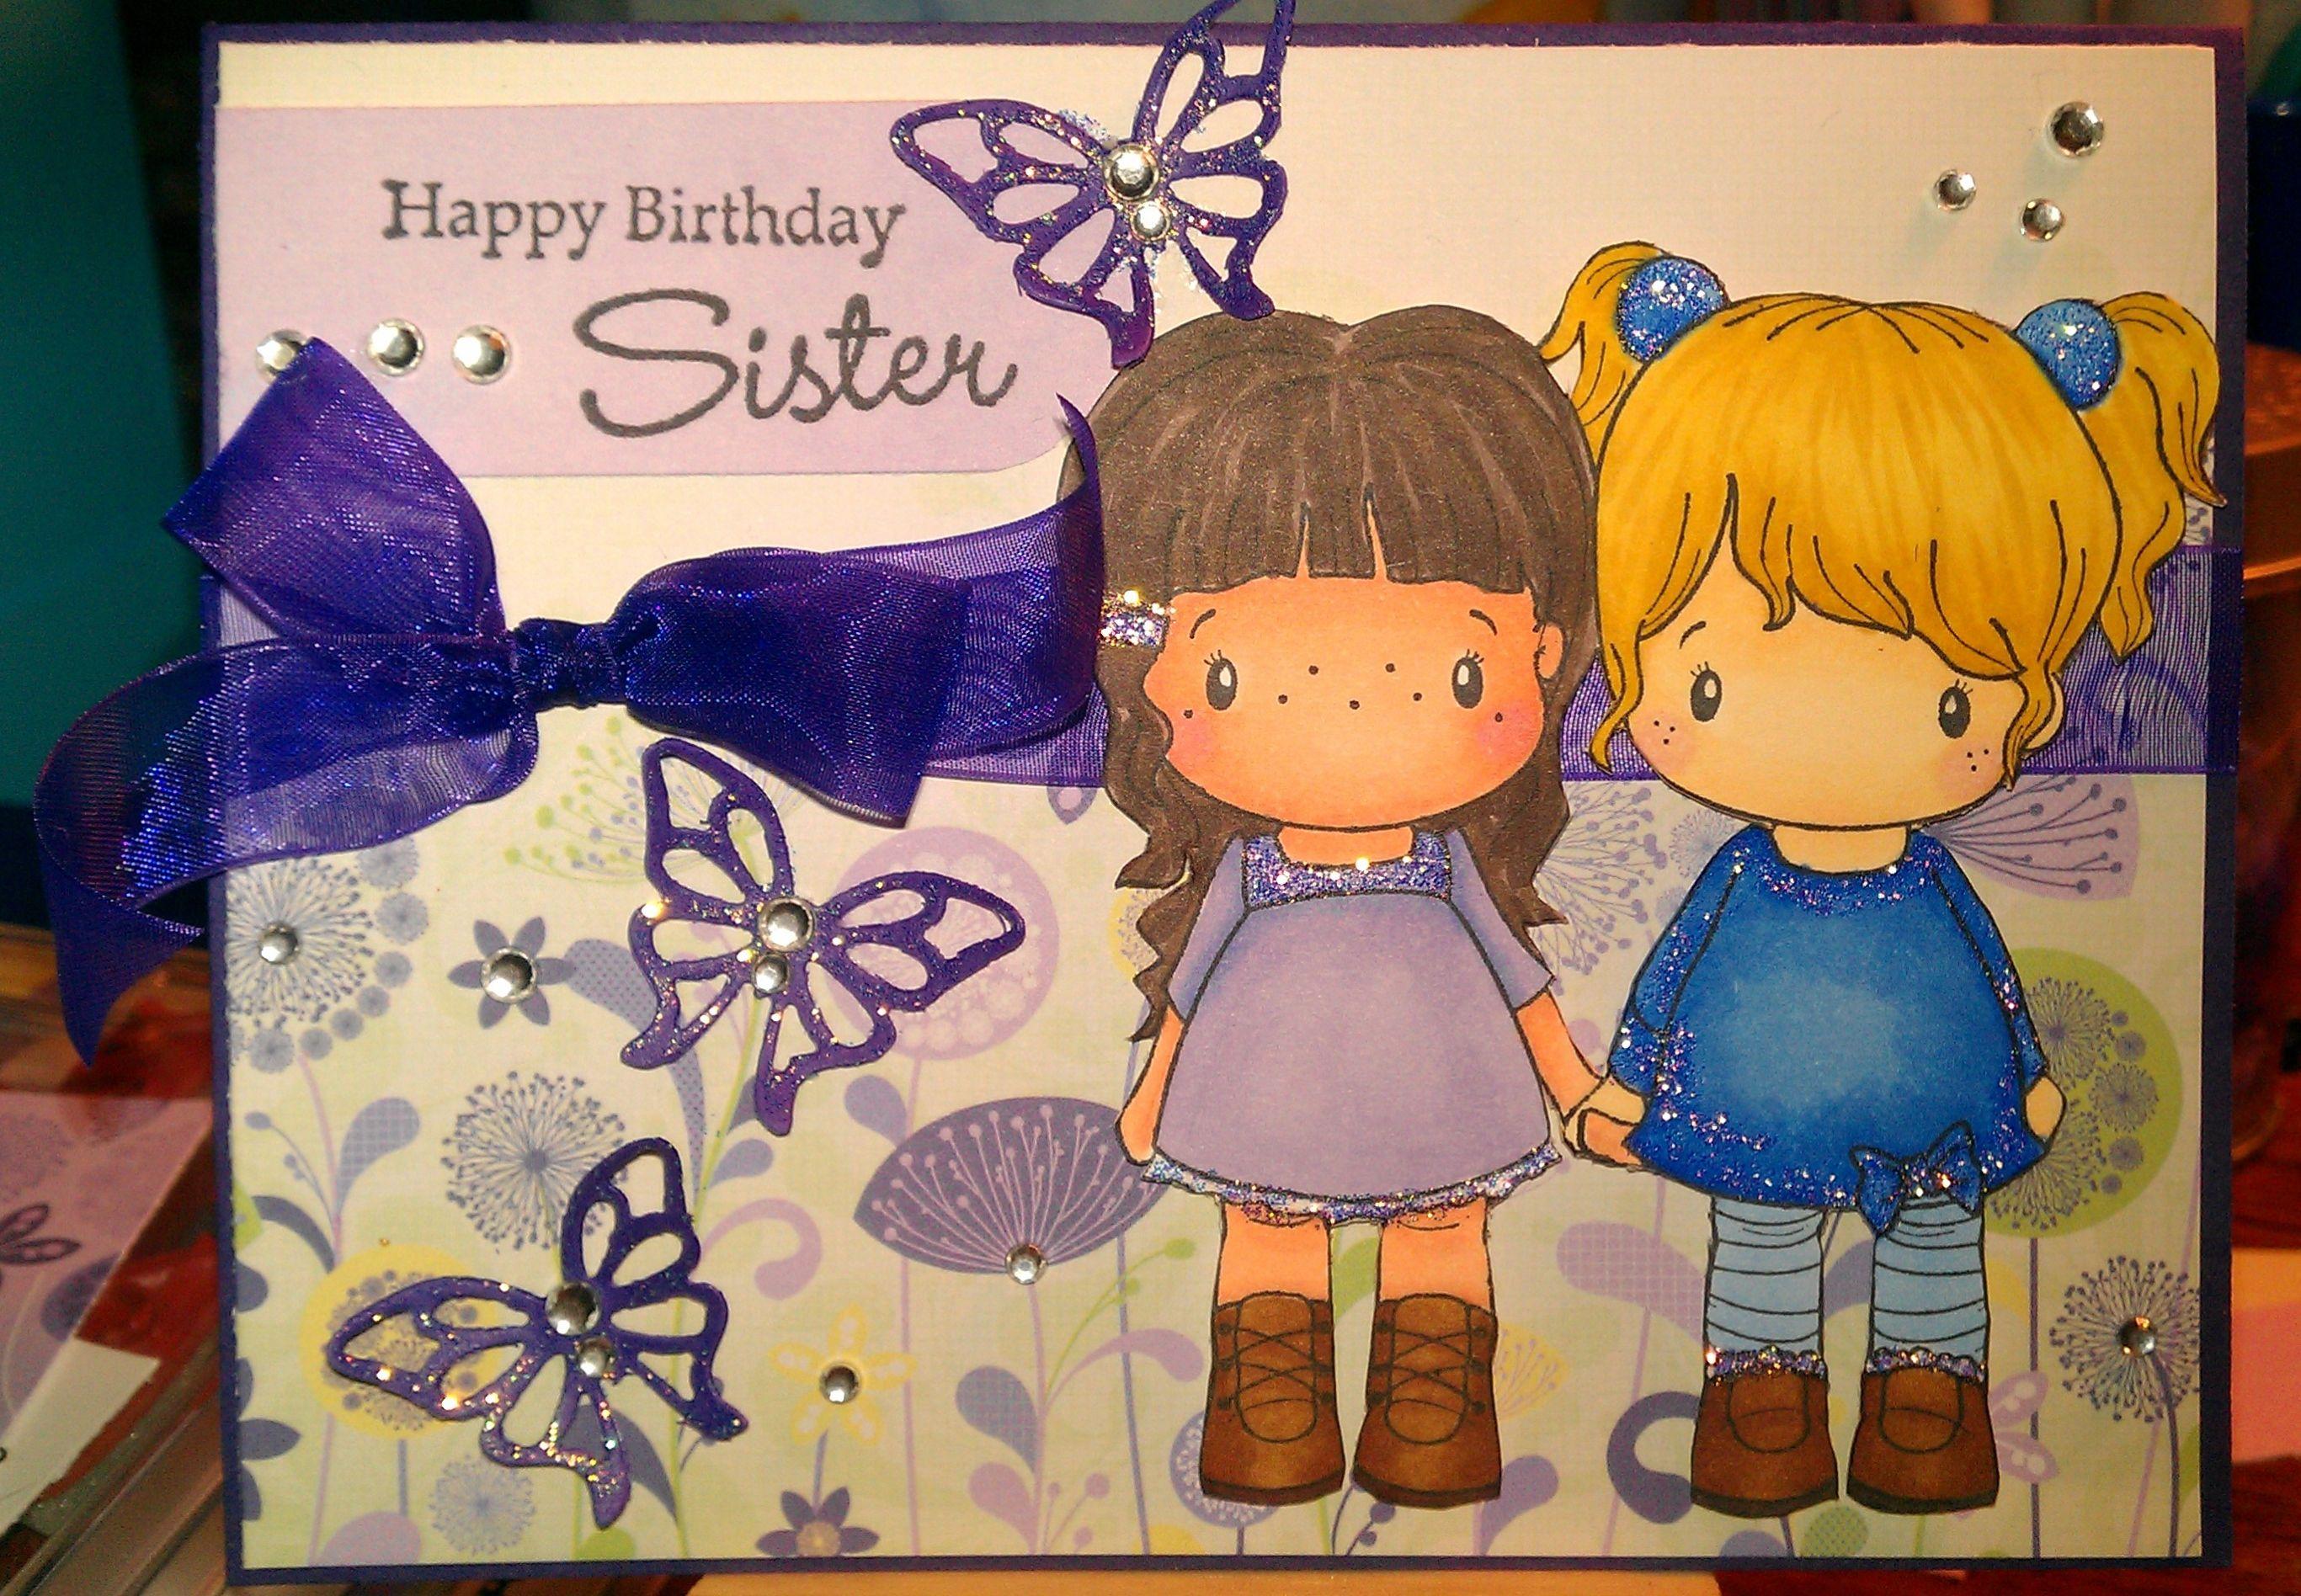 Happy Birthday Little Sister! Happy birthday sister